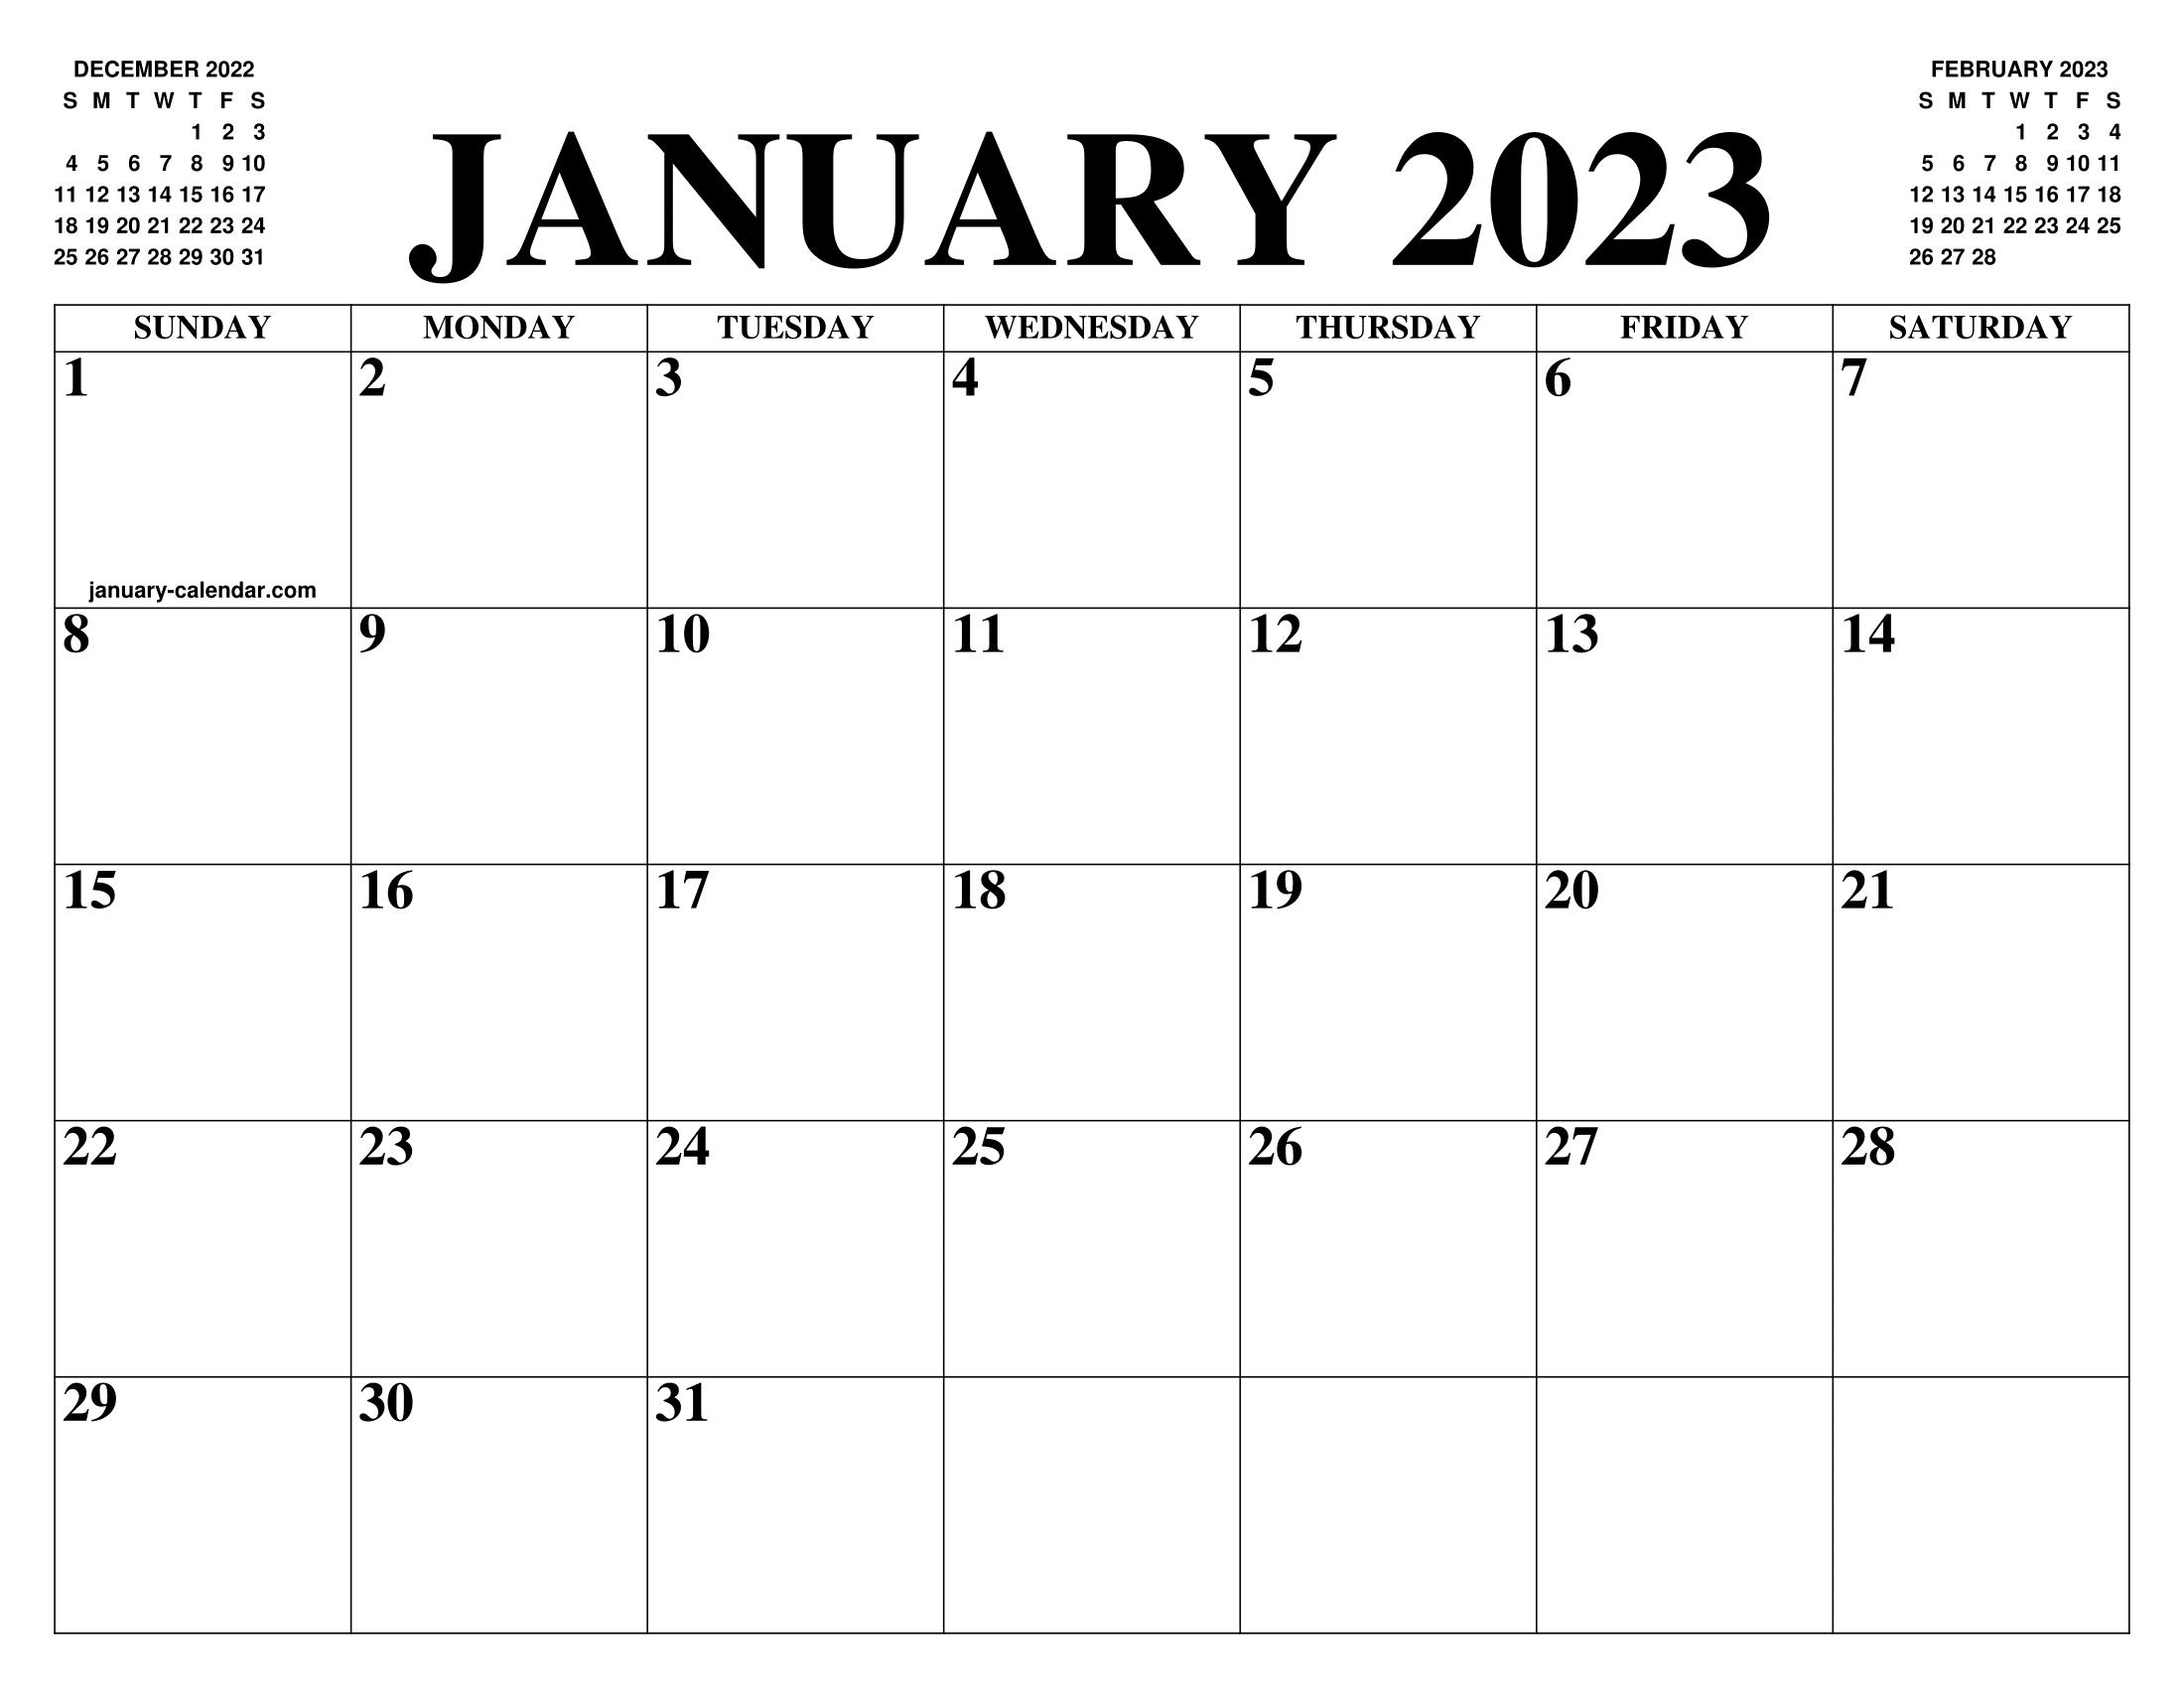 December 2023 And January 2022 Calendar.January 2023 Calendar Of The Month Free Printable January Calendar Of The Year Agenda